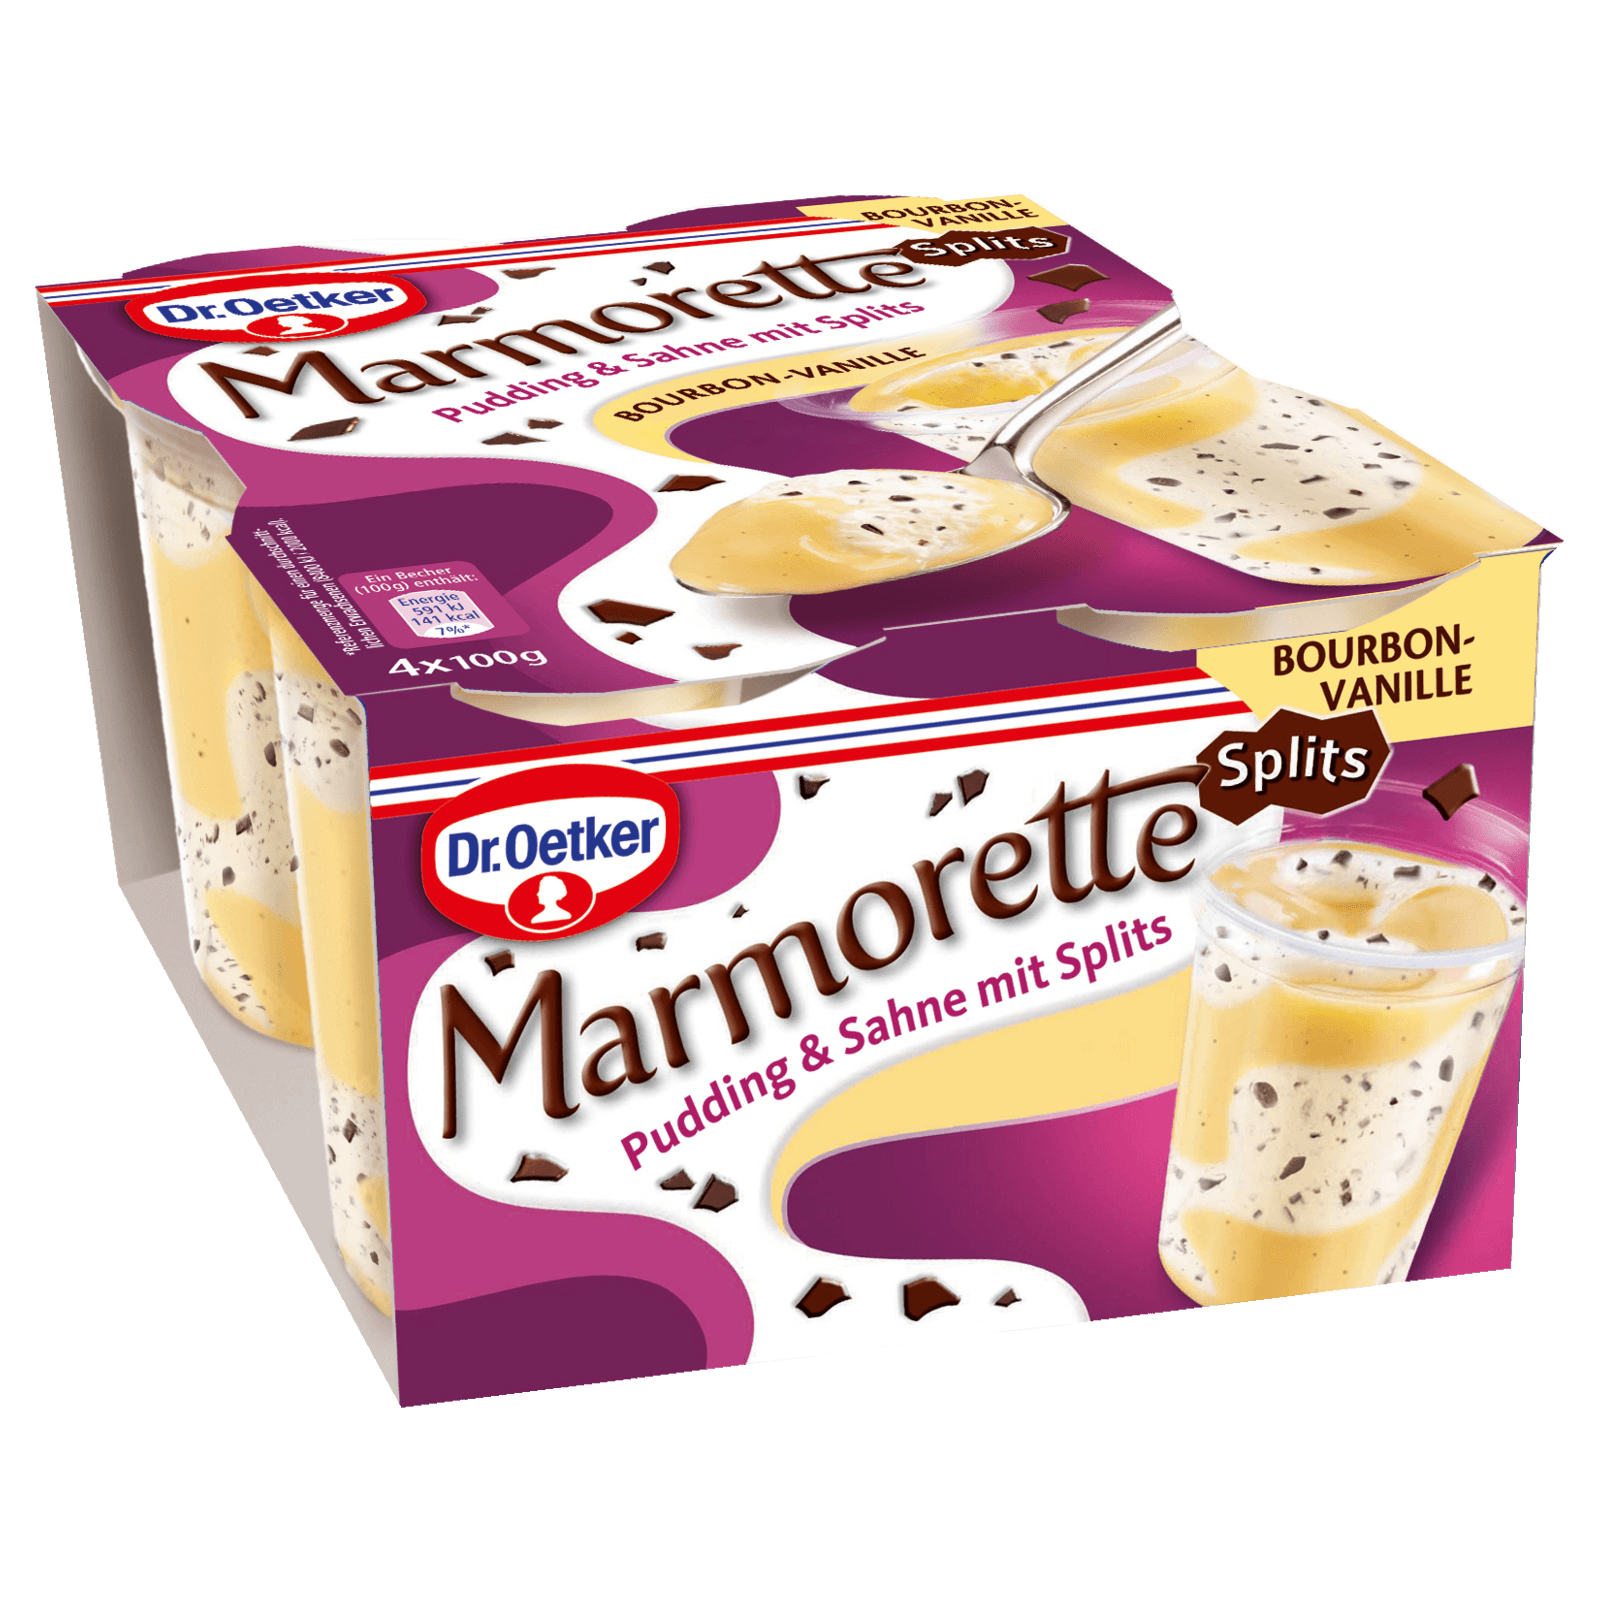 Dr. Oetker Marmorette Pudding Vanille mit Splits 4x100g